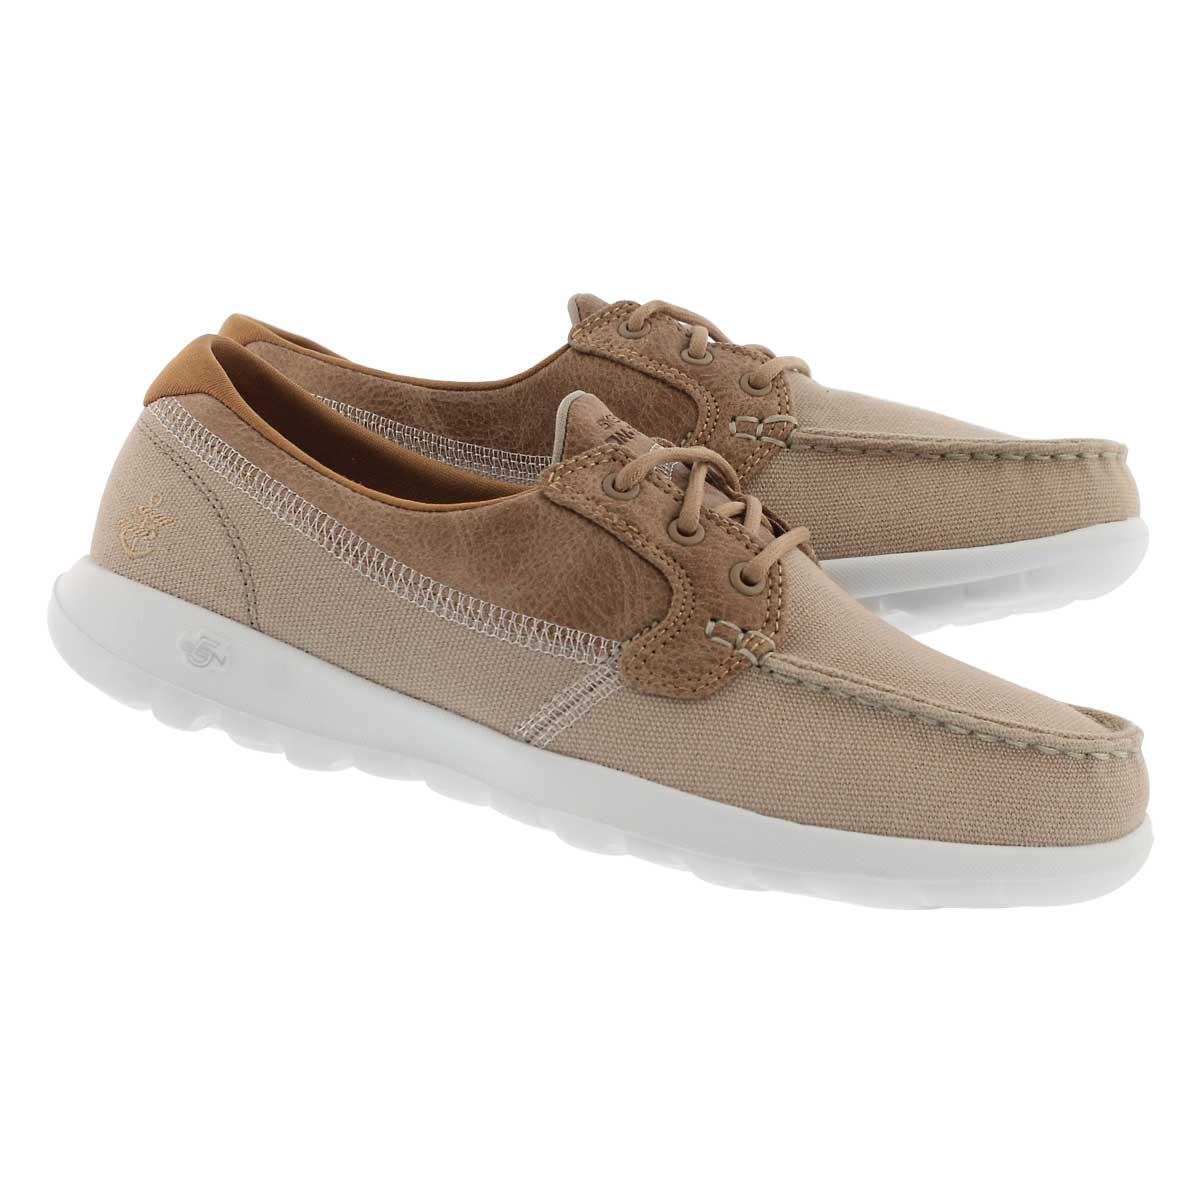 Chaussures bateau GO WALK LITE, naturel, femmes